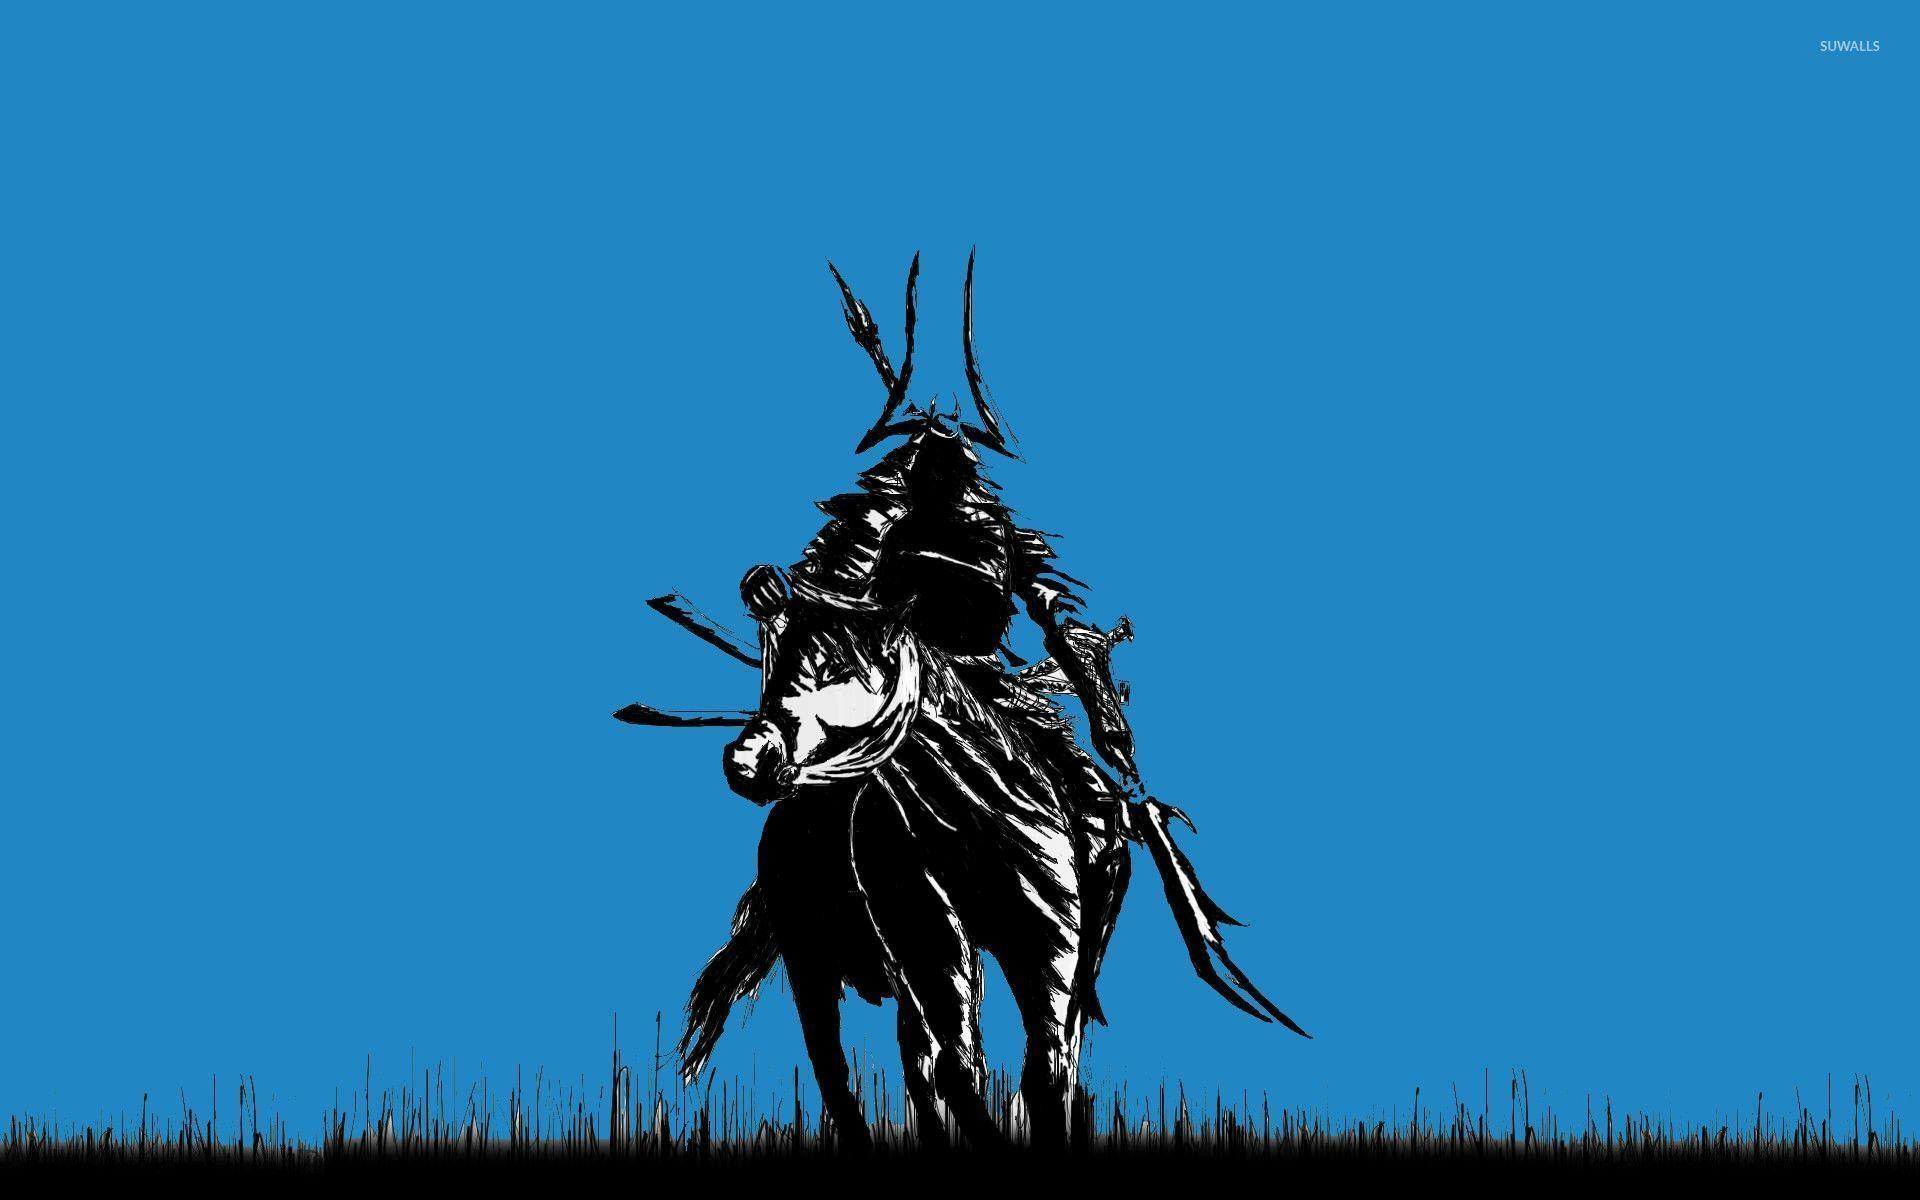 Samurai On A Horse Wallpaper Artistic Wallpapers 28634